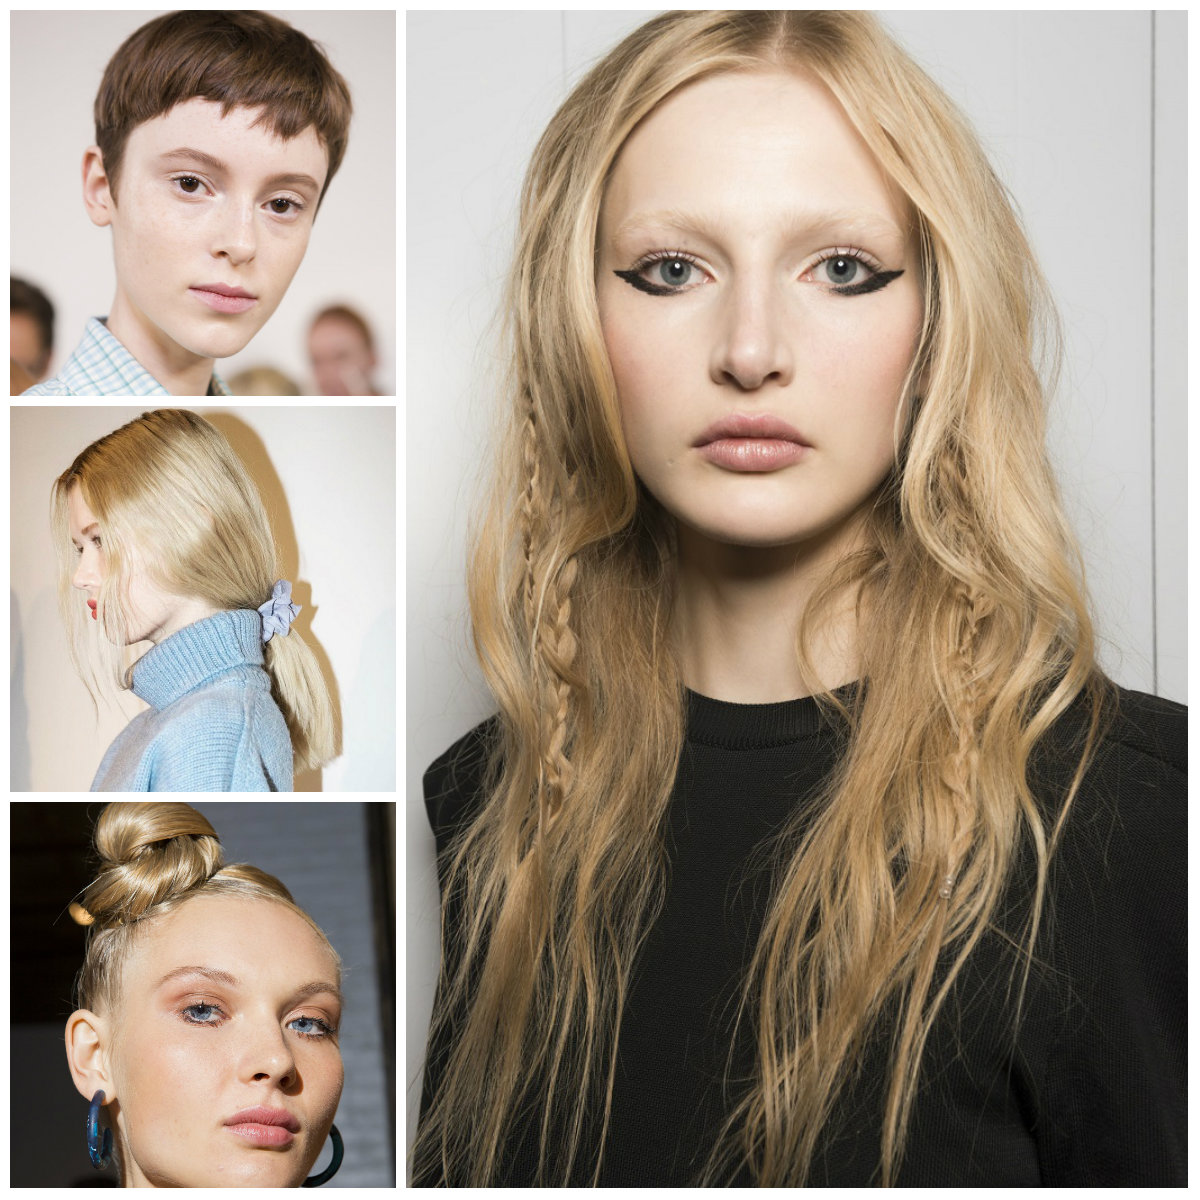 2018 fashion week hairstyles